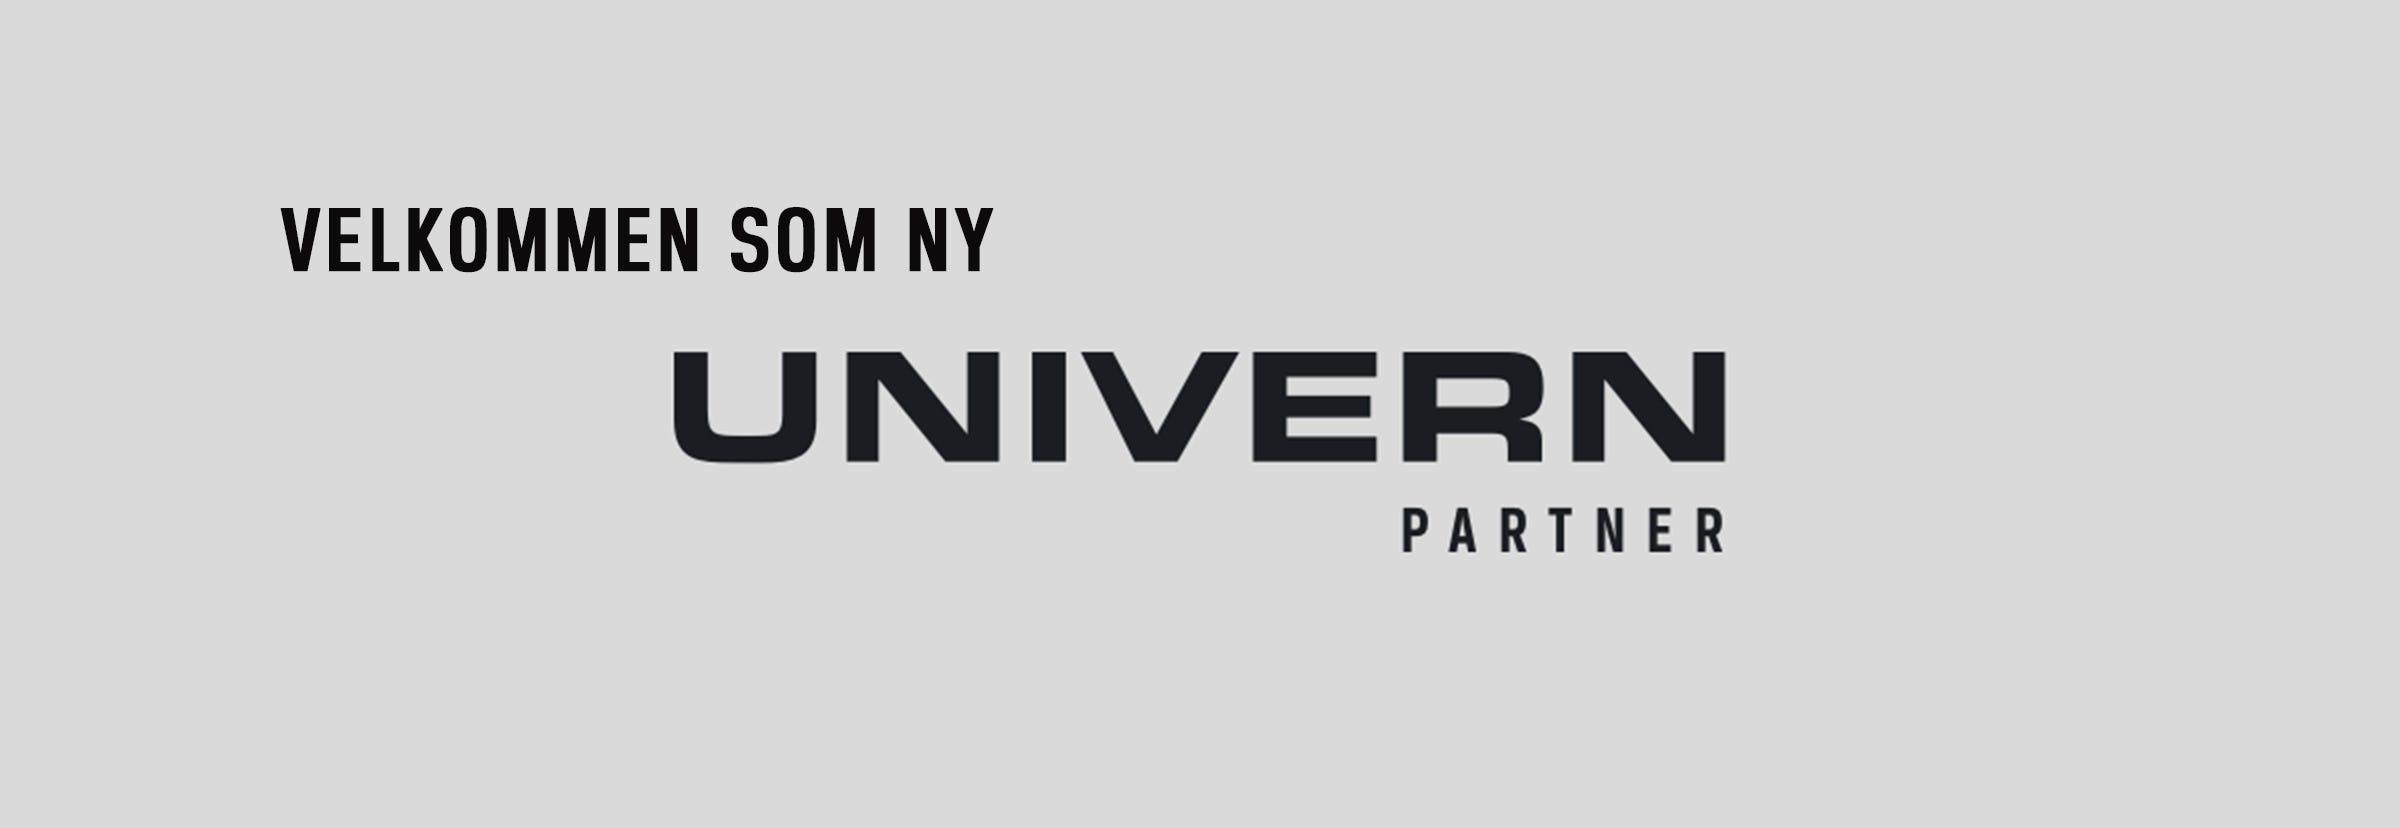 Nye Univern-partnere